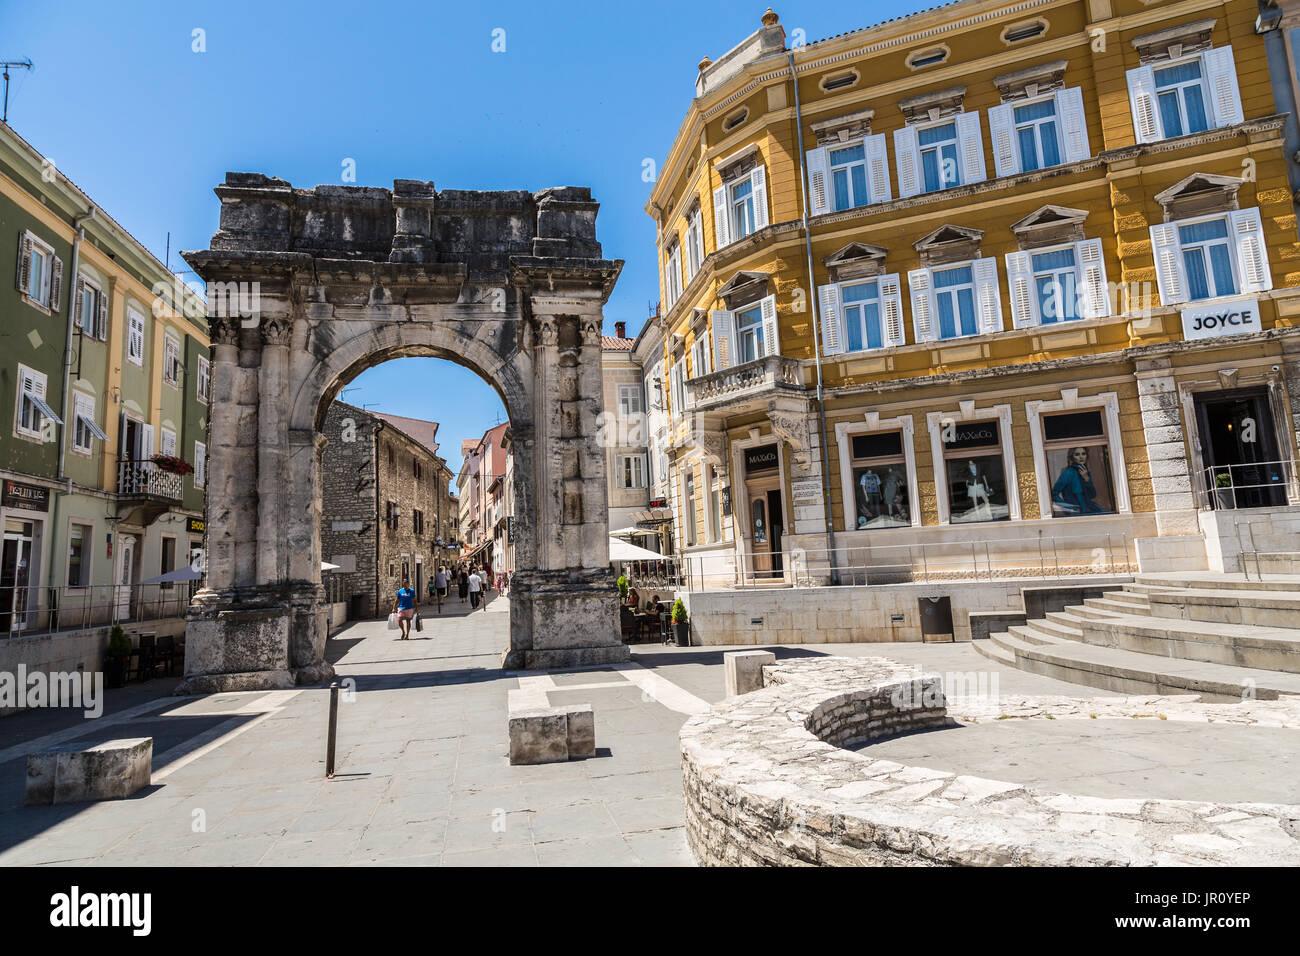 Pula, Croatia downtown architecture - Stock Image